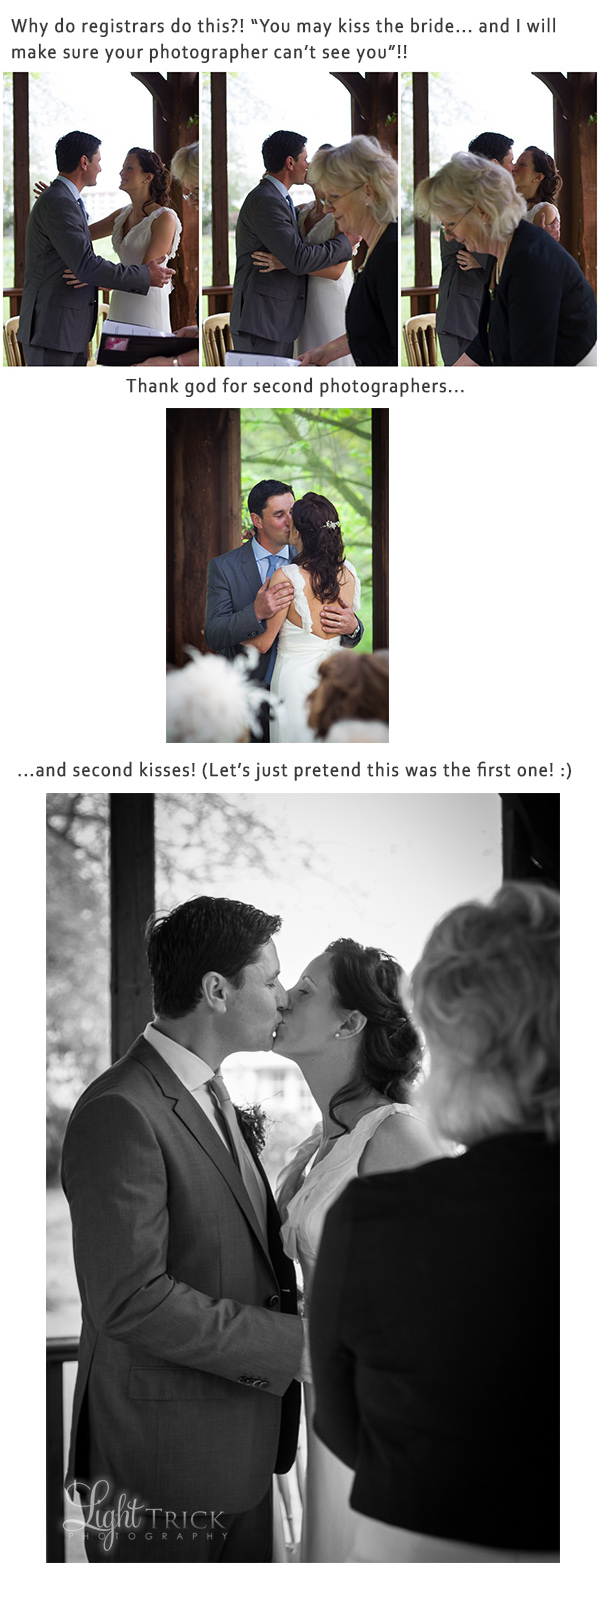 wedding photographer misses first kiss